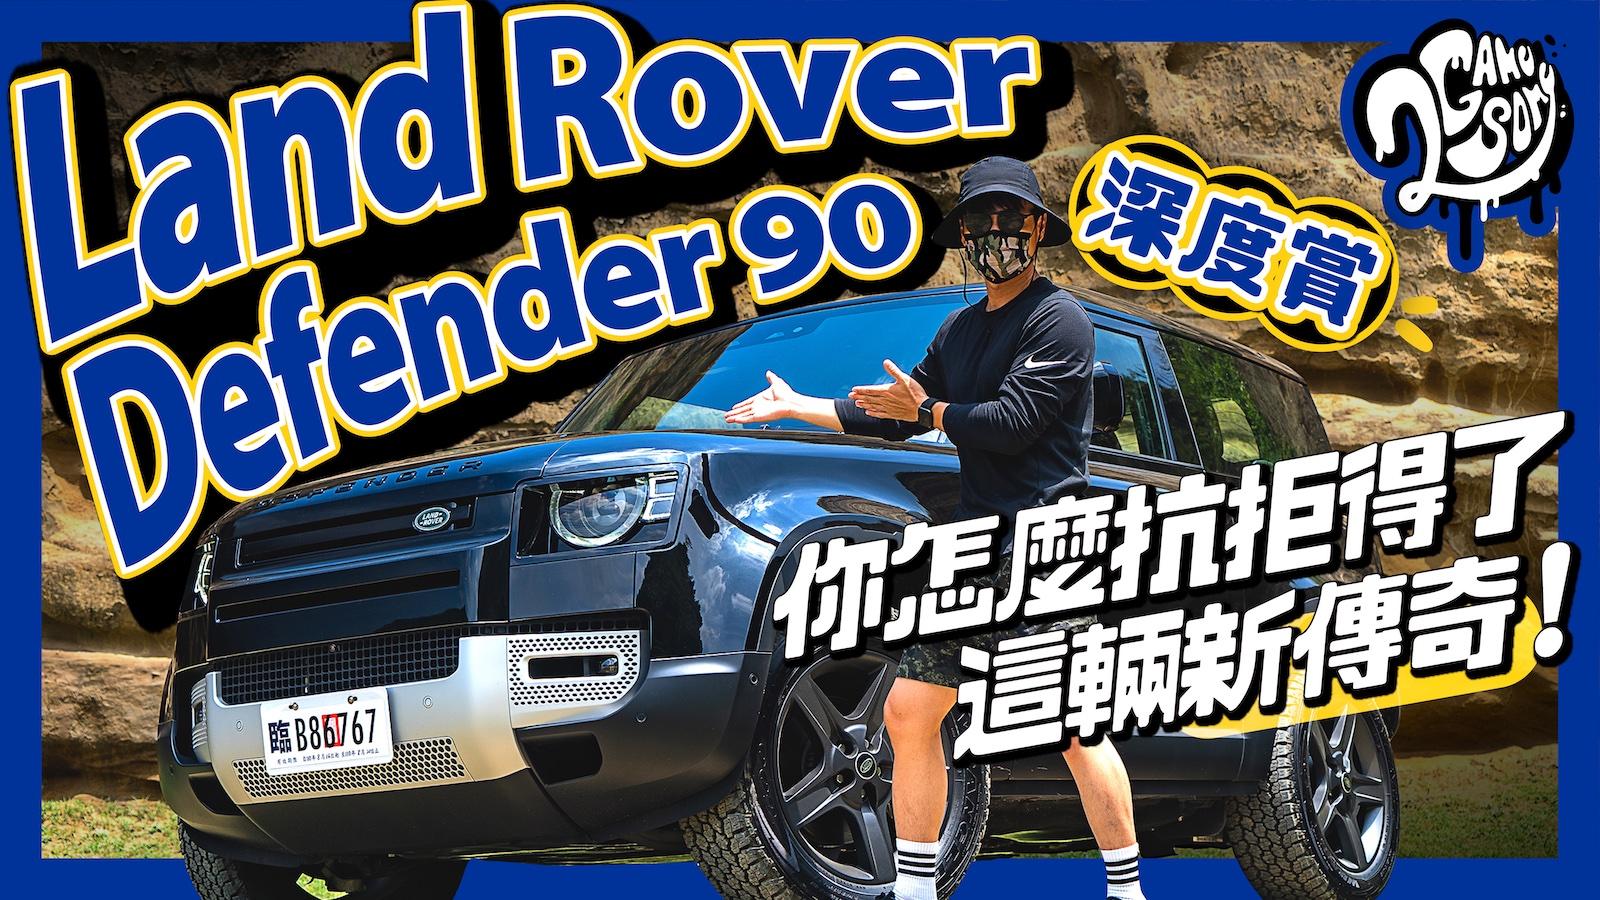 Land Rover Defender 90 深度賞|所有面向完整解析!你怎麼抗拒得了這輛新傳奇!